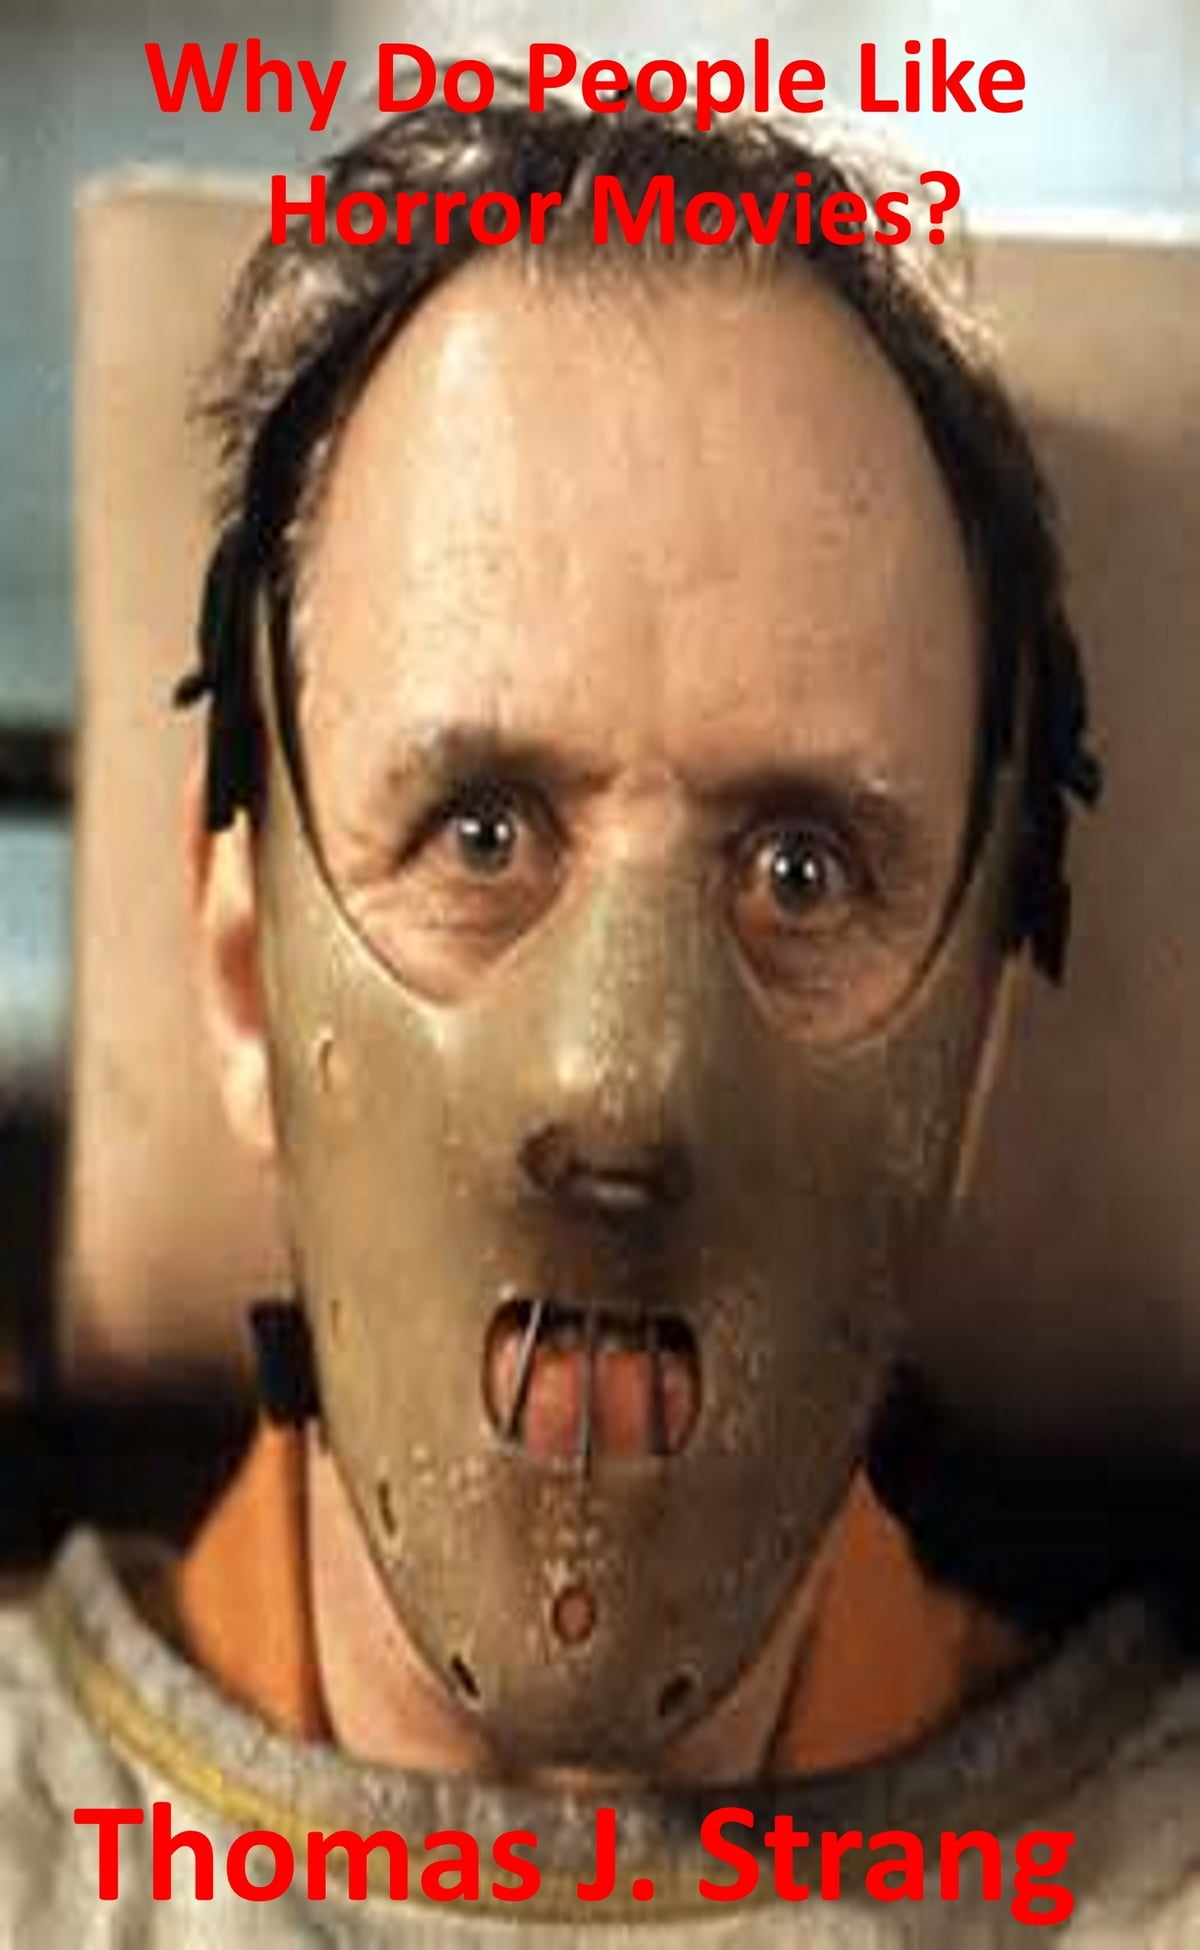 Why Do You Like Horror Movies Ebook By Thomas J Strang